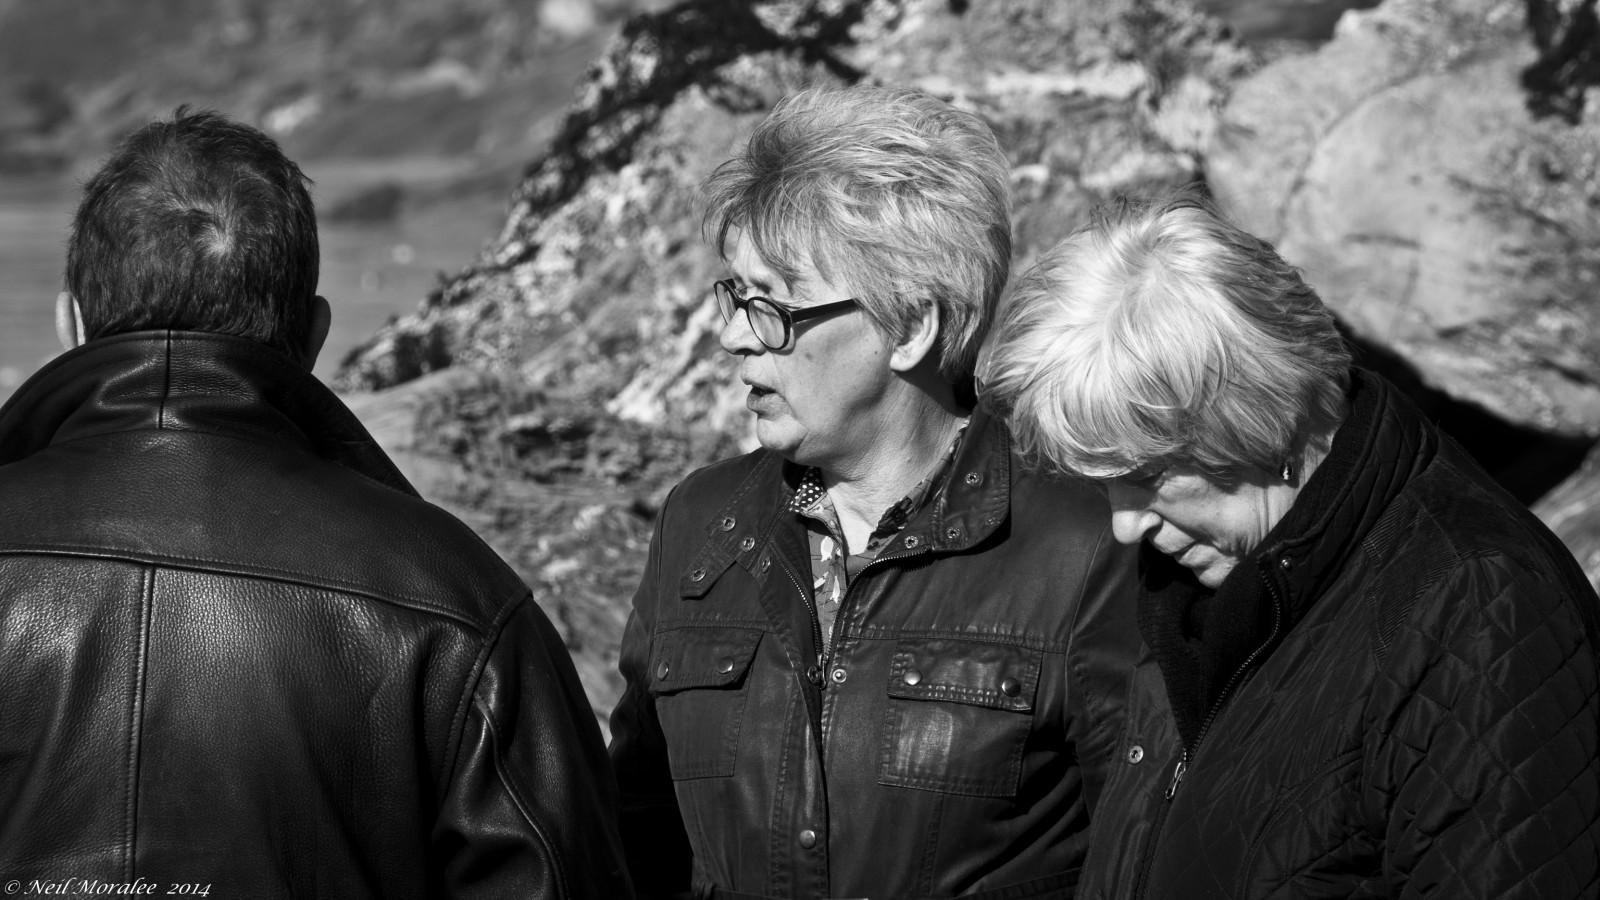 Wallpaper  Life, Old, People, Blackandwhite, Bw, Woman -5430